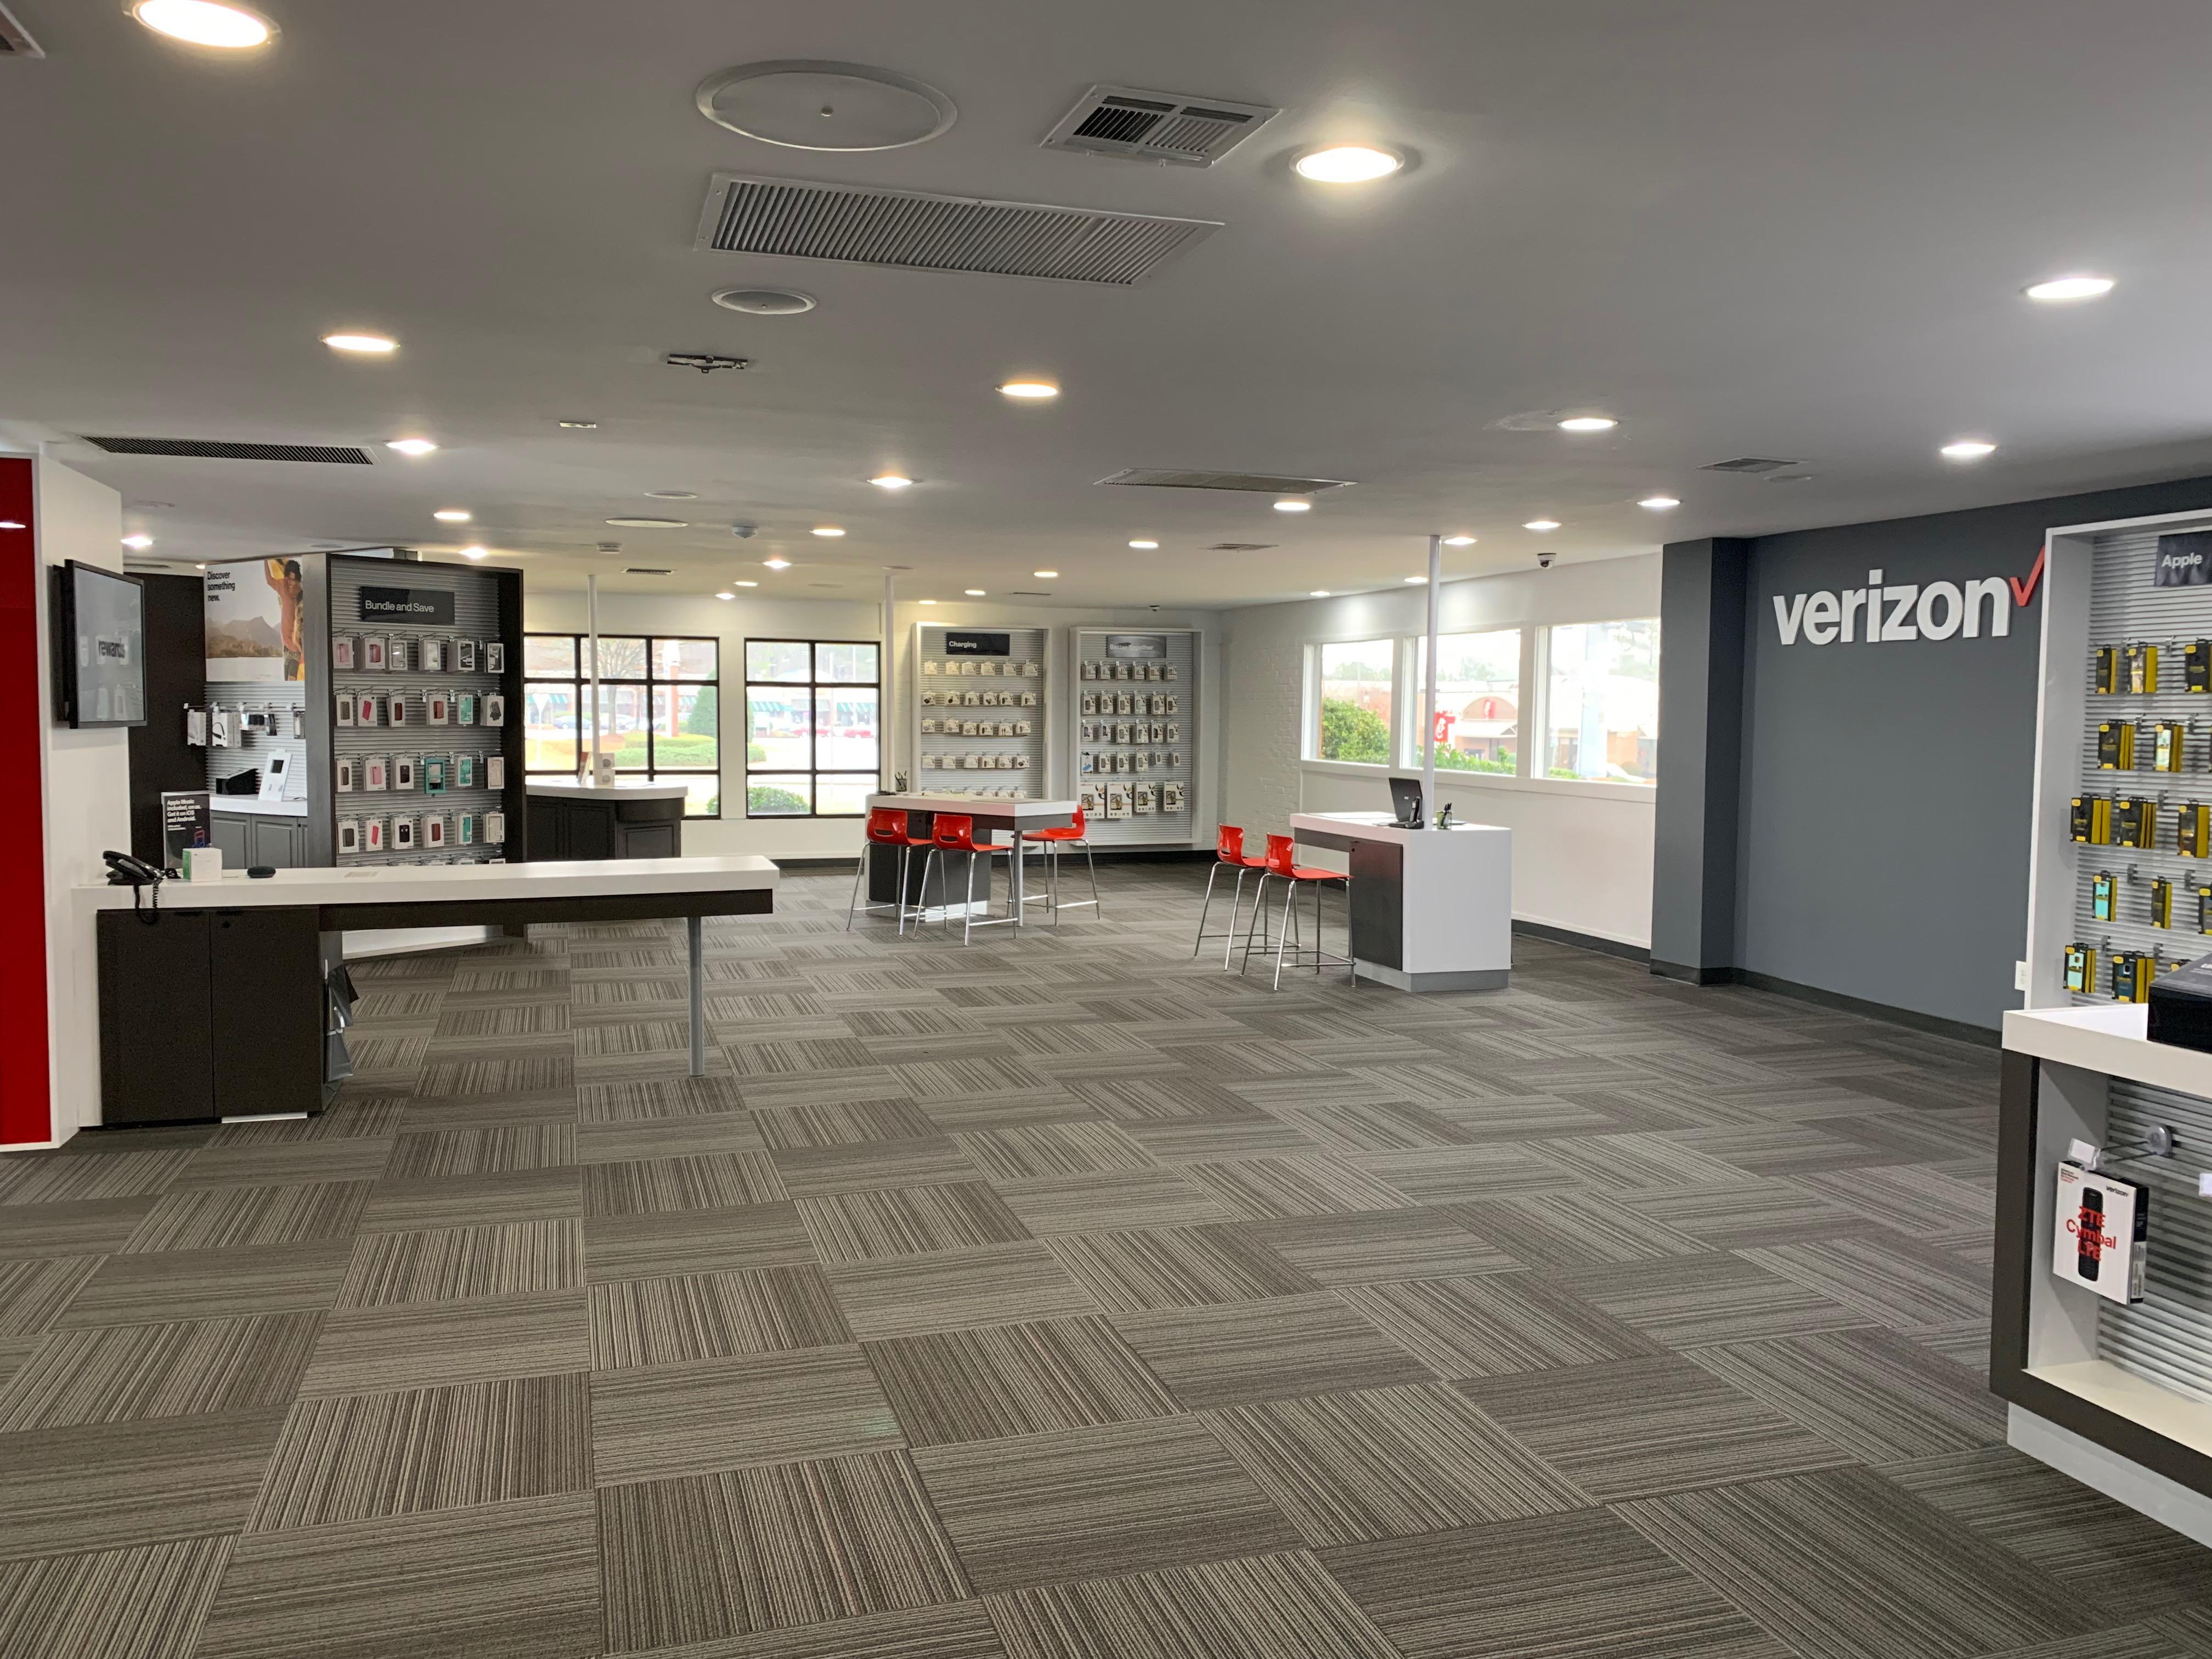 Verizon Authorized Retailer – TCC image 3